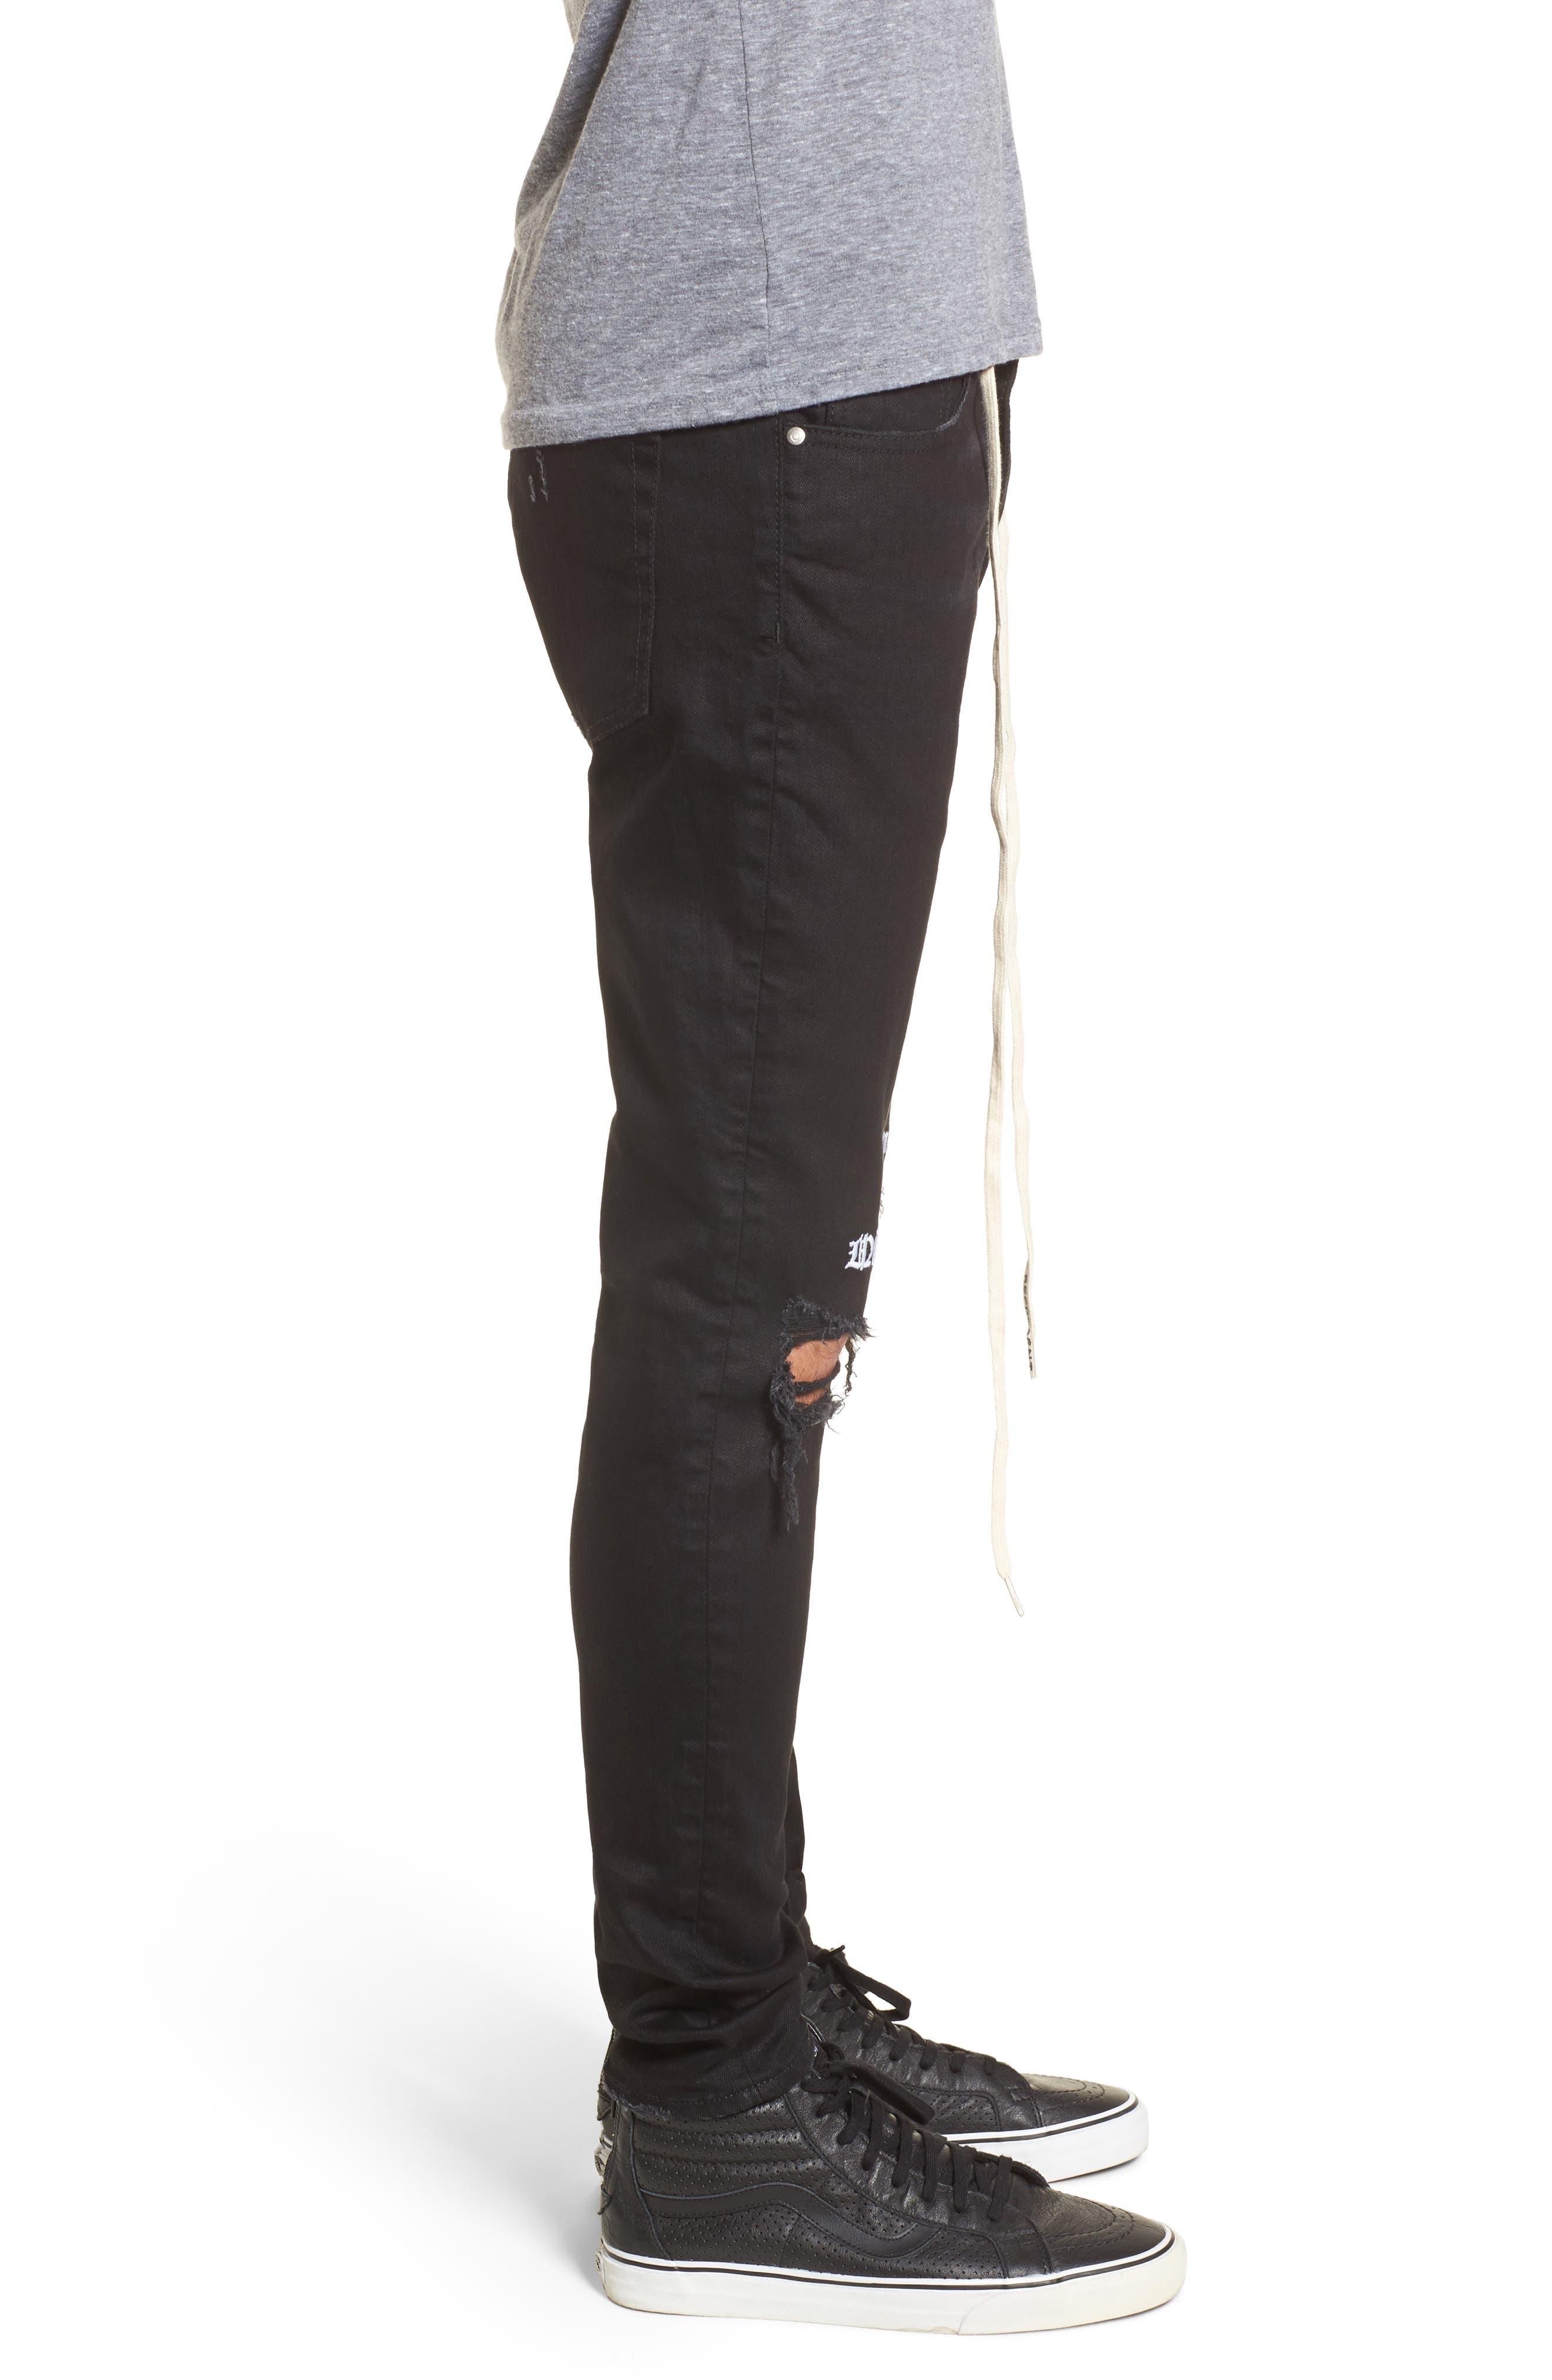 Destroyer Slim Fit Jeans,                             Alternate thumbnail 3, color,                             001